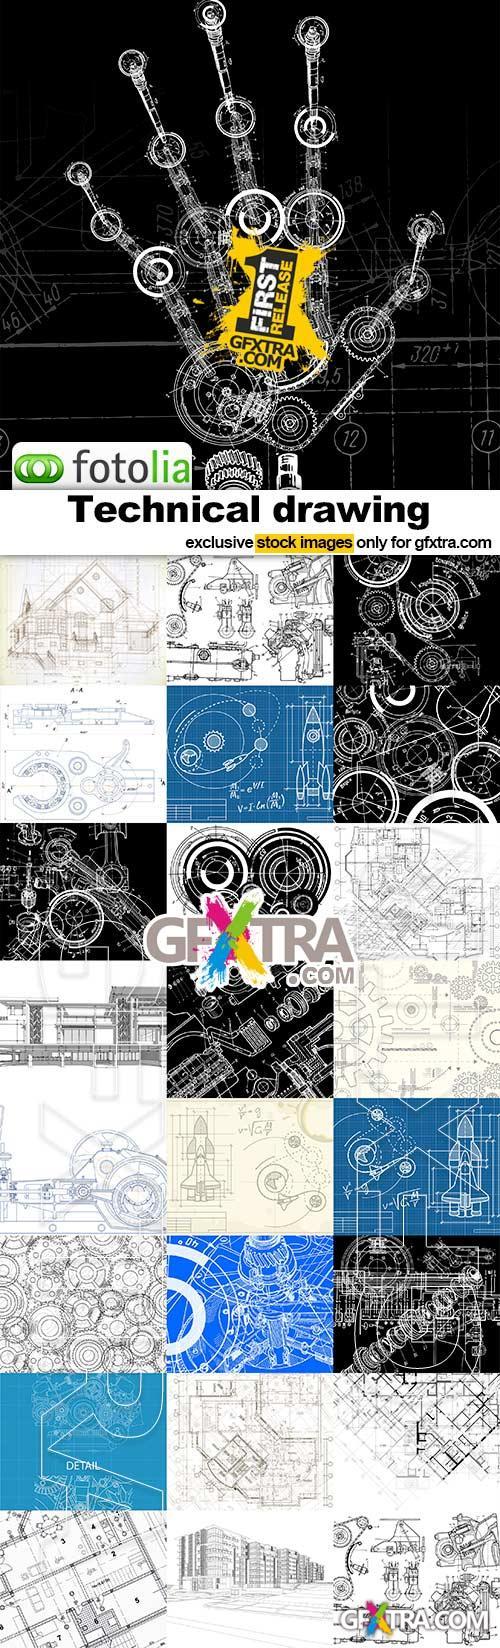 Technical Drawing - 20x EPS + 4 JPEG